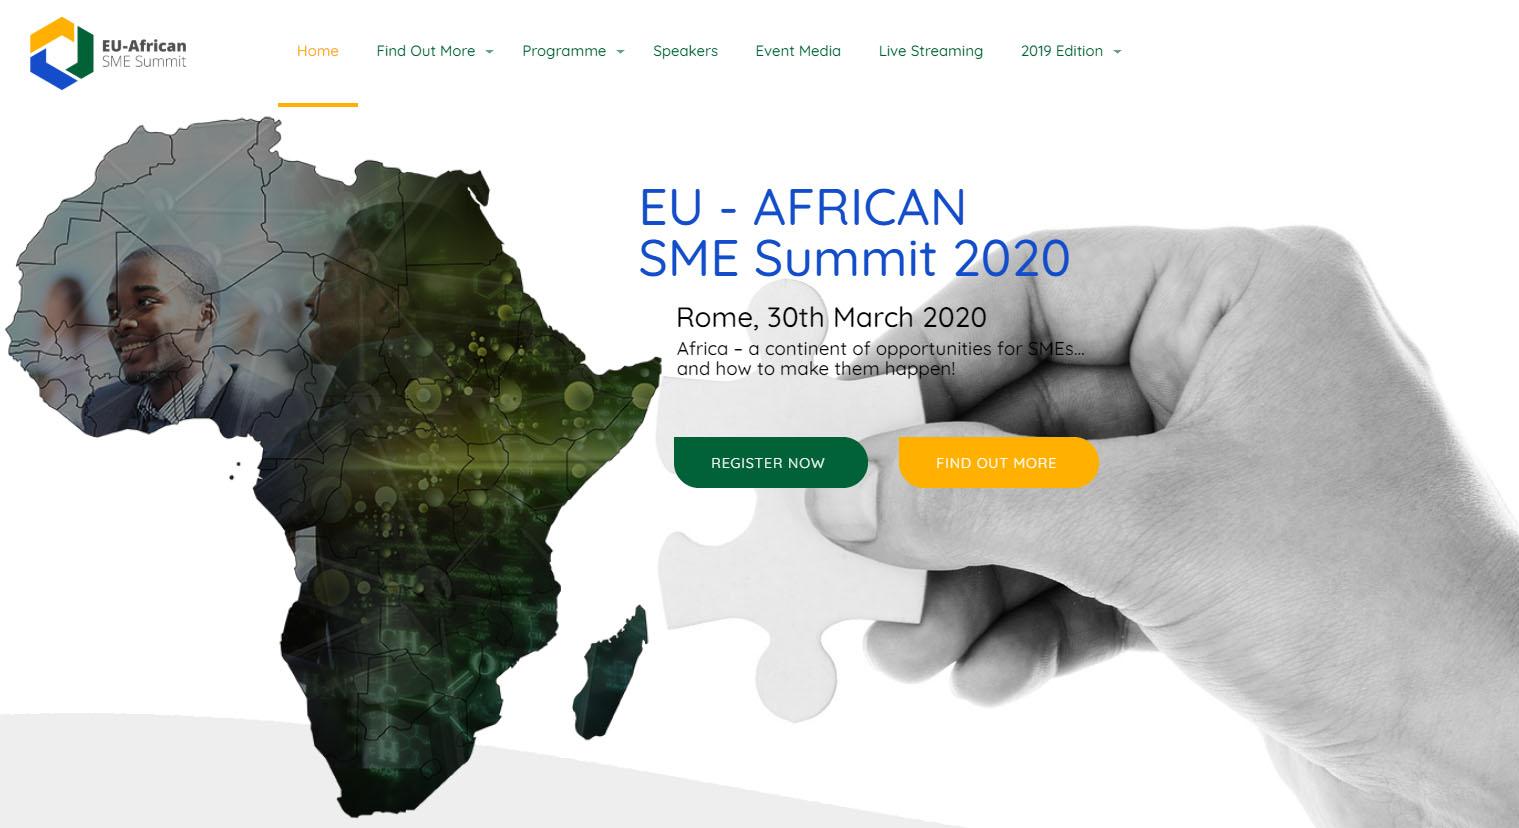 EU-African - SME Summit